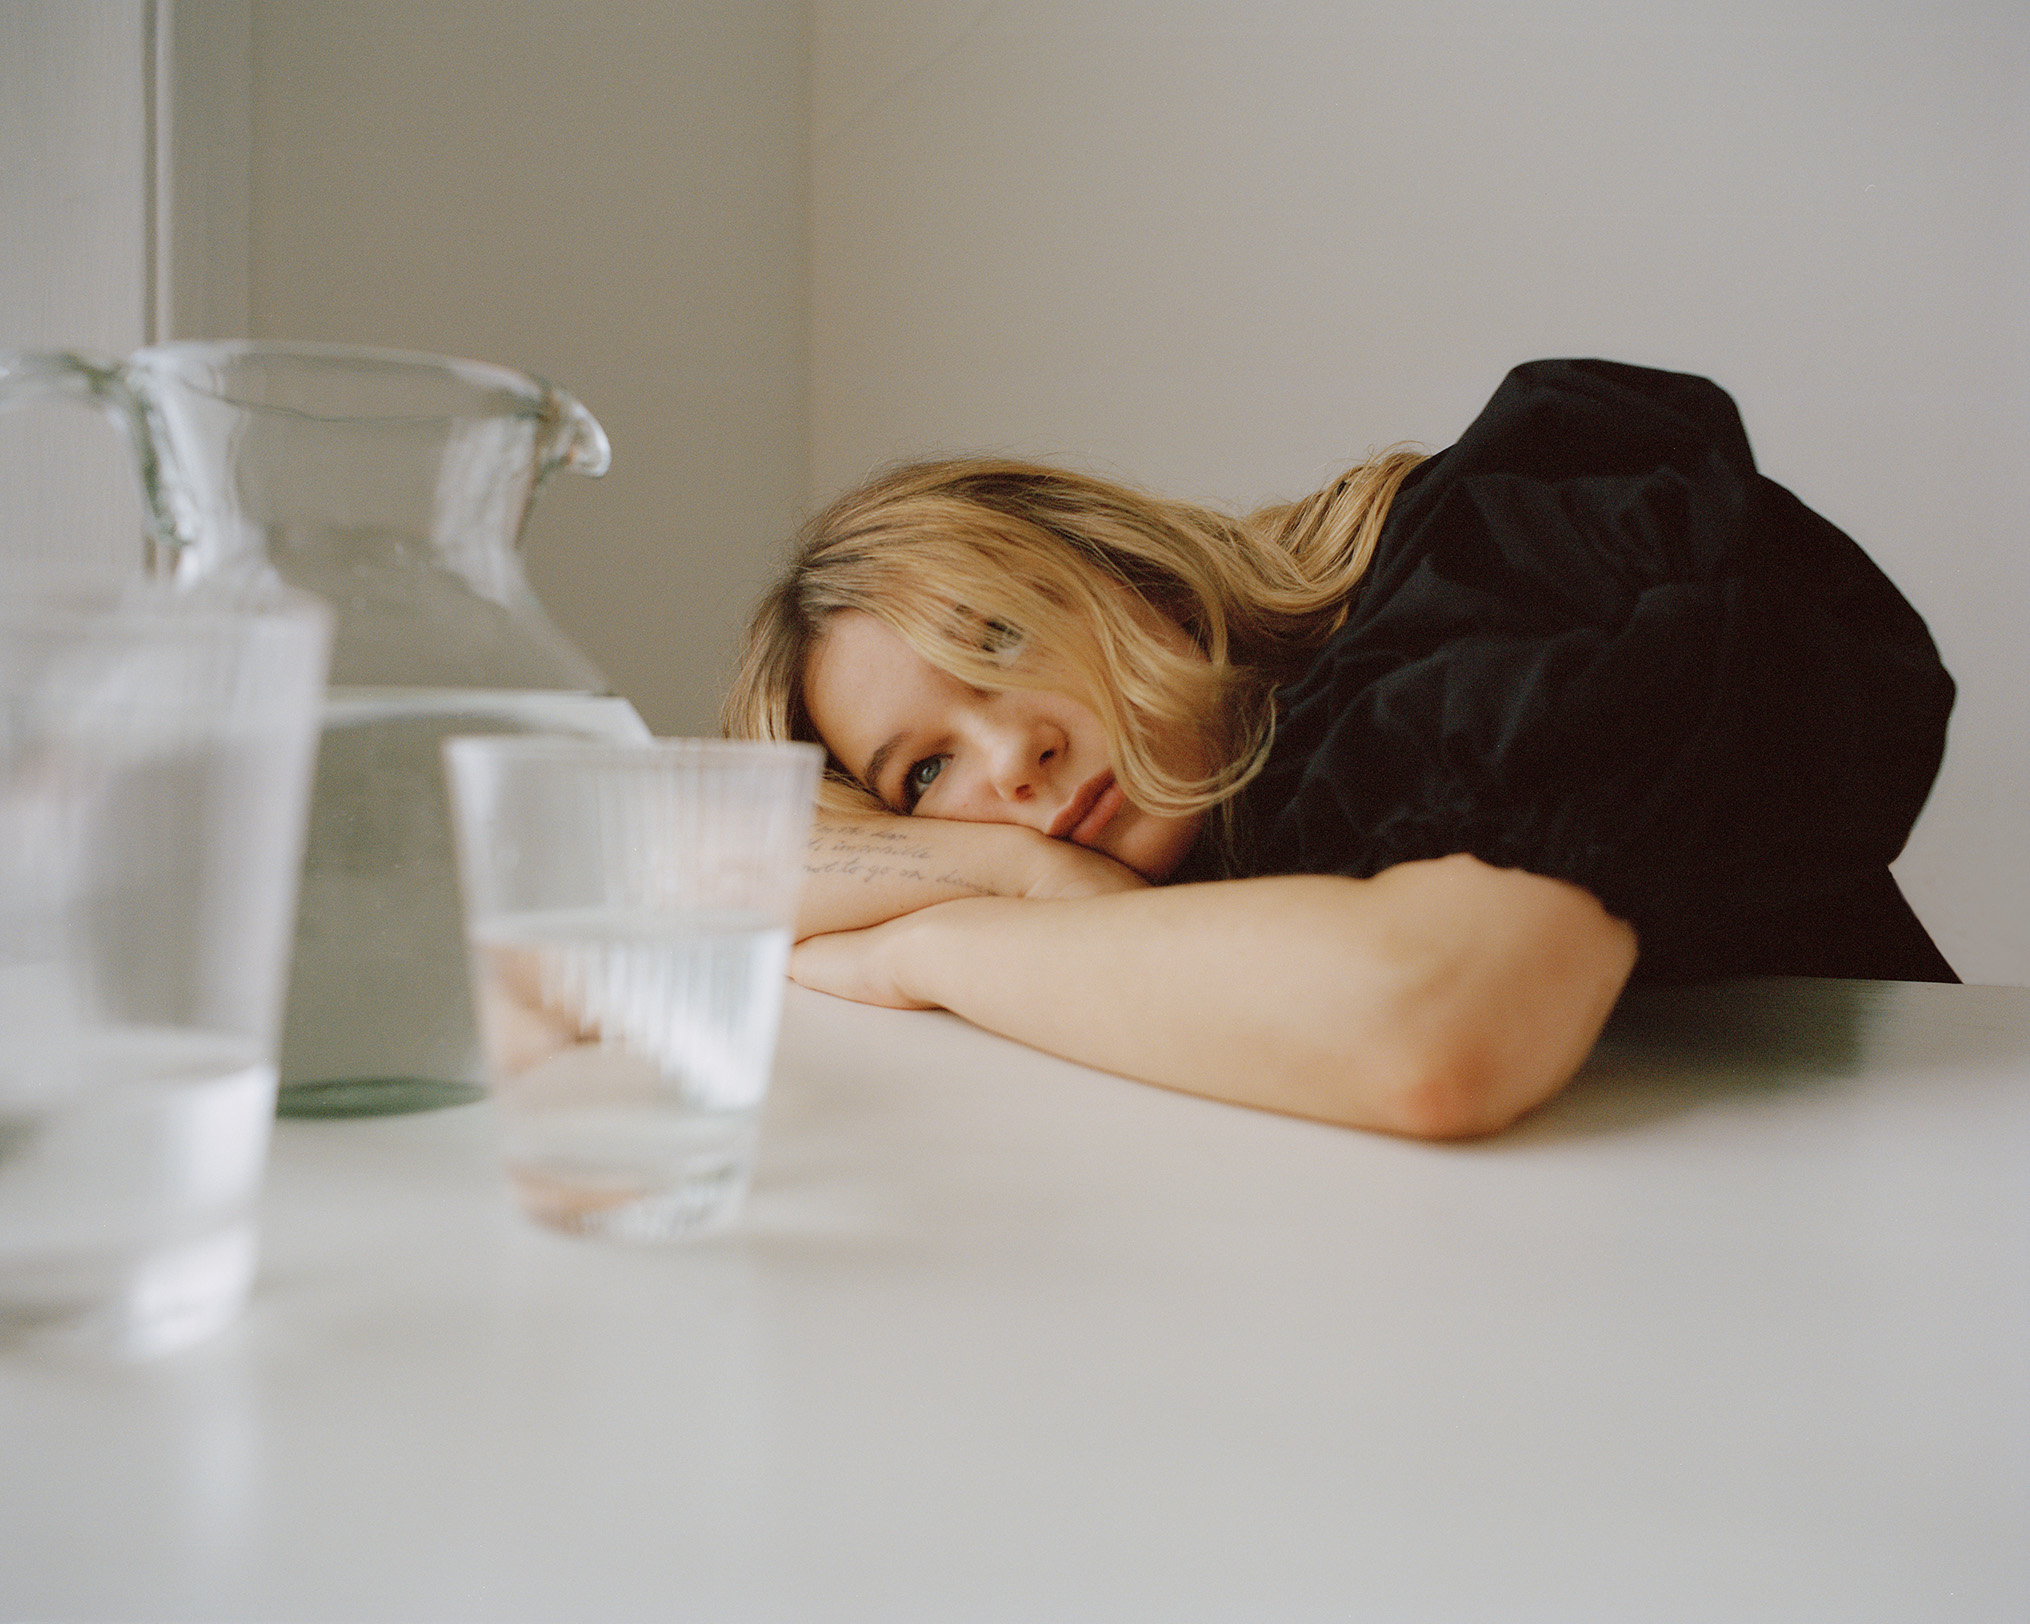 Soho House | Esme Creed-Miles